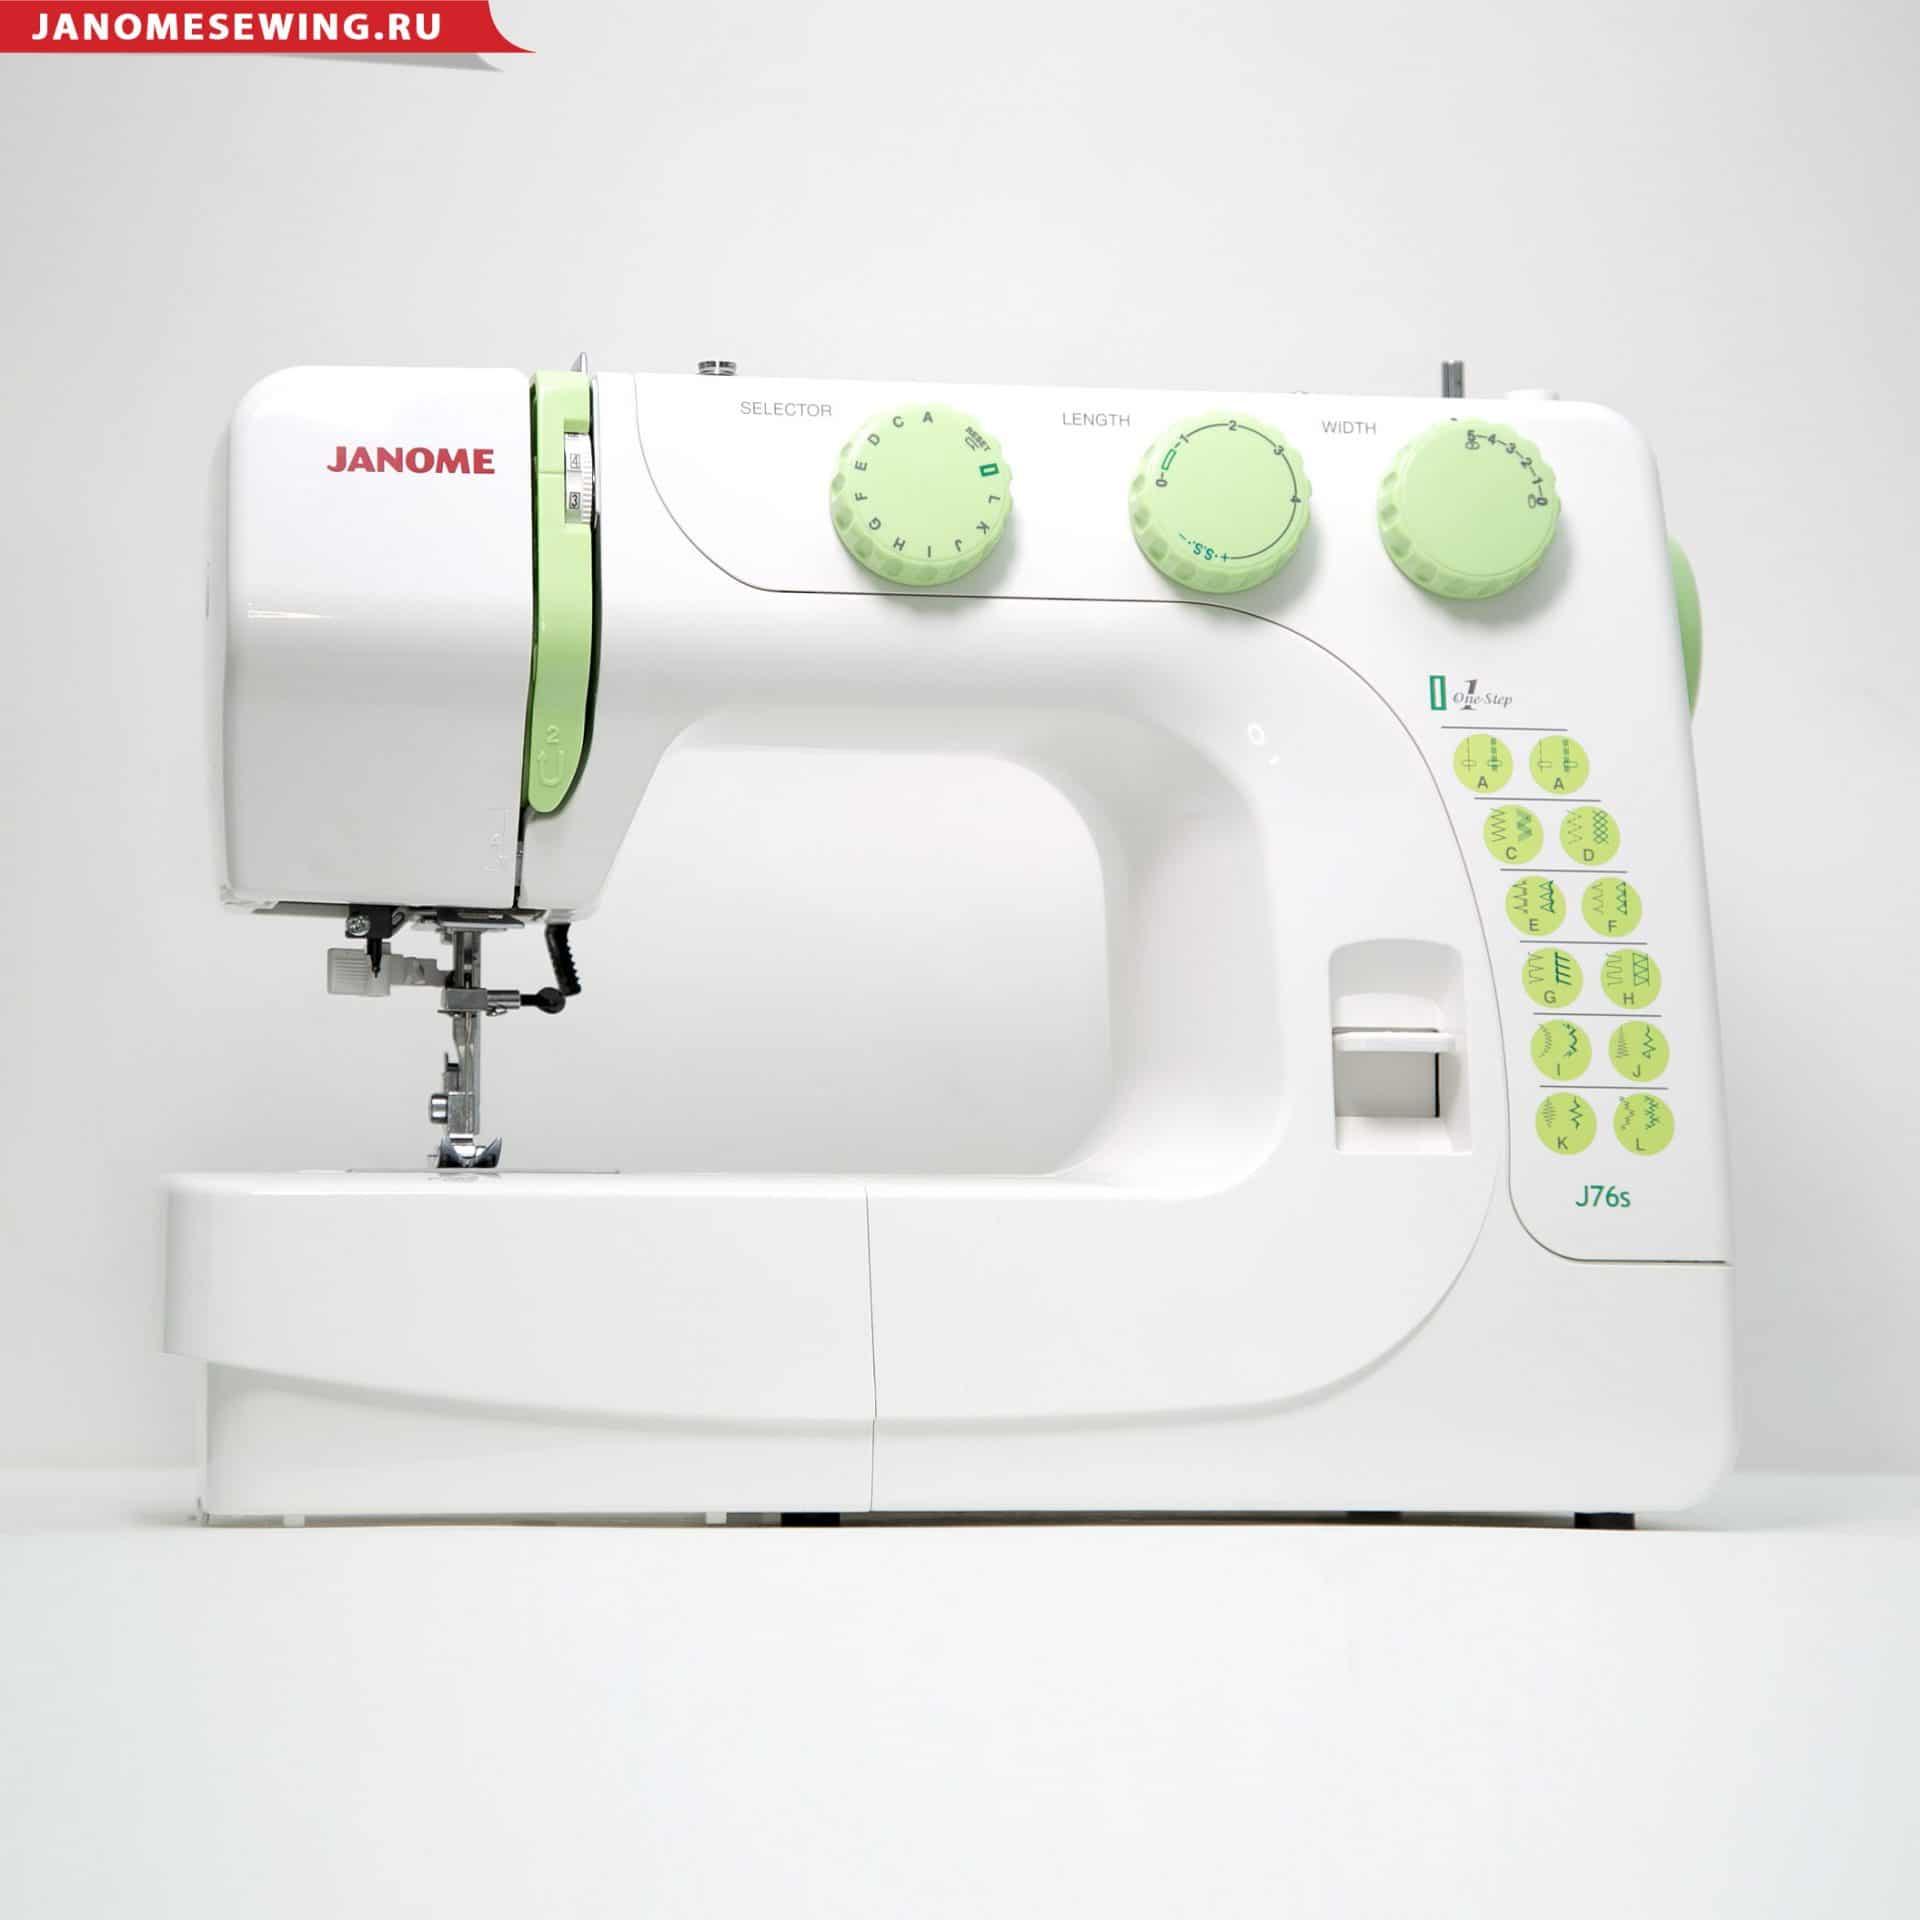 Швейная машина Janome J76